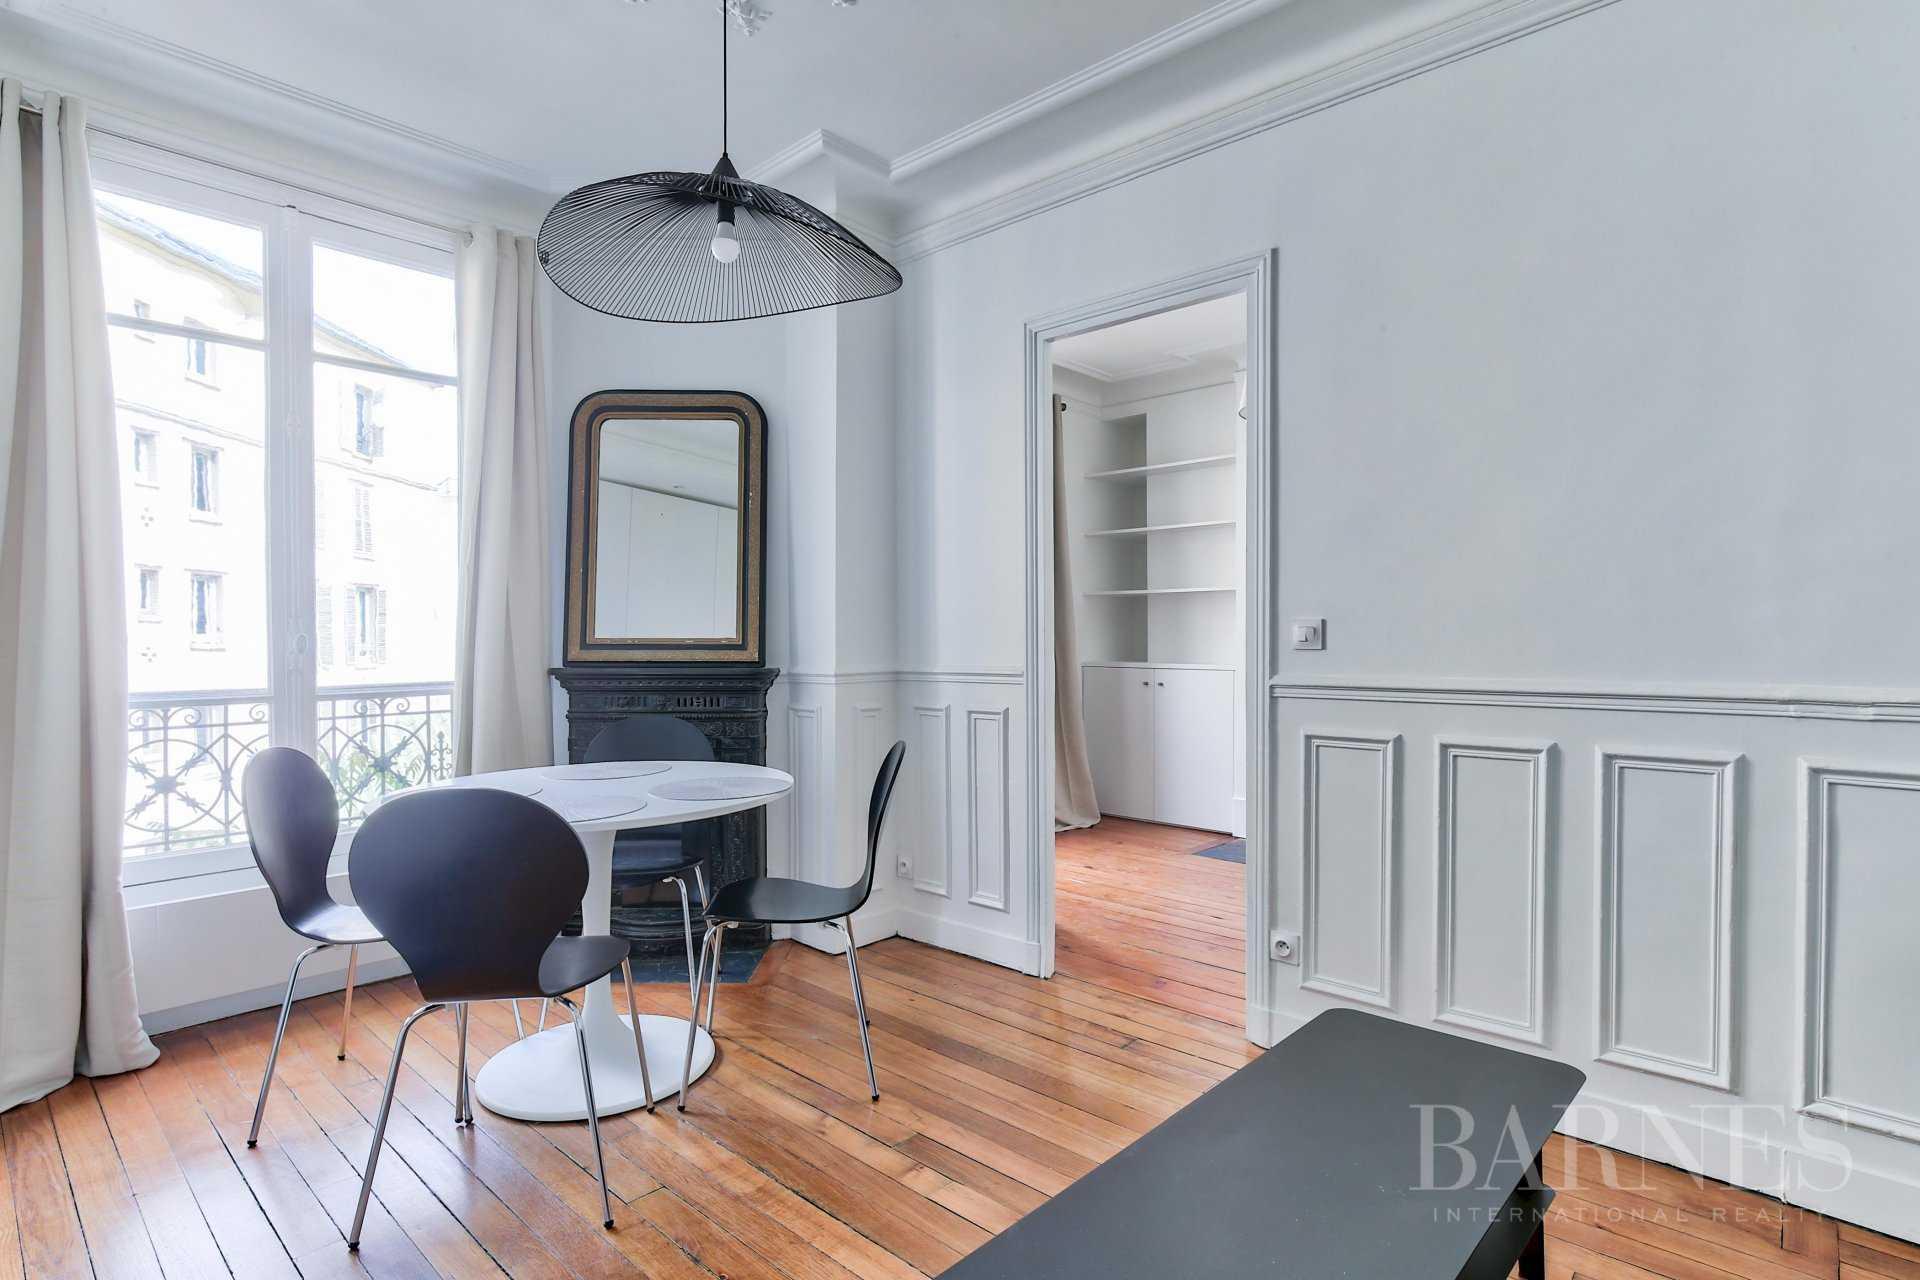 Appartement Boulogne-Billancourt  -  ref 3124215 (picture 2)